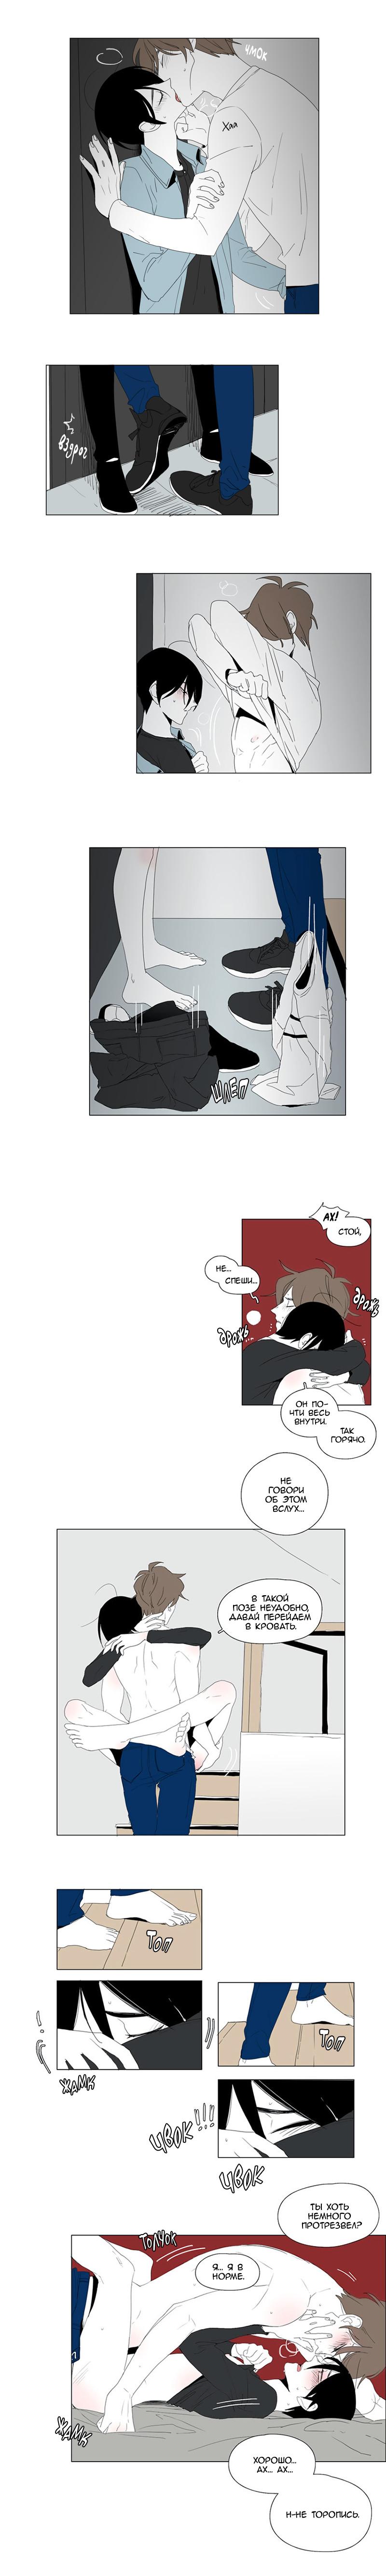 https://r1.ninemanga.com/comics/pic2/33/27873/333362/1504714630861.jpg Page 10